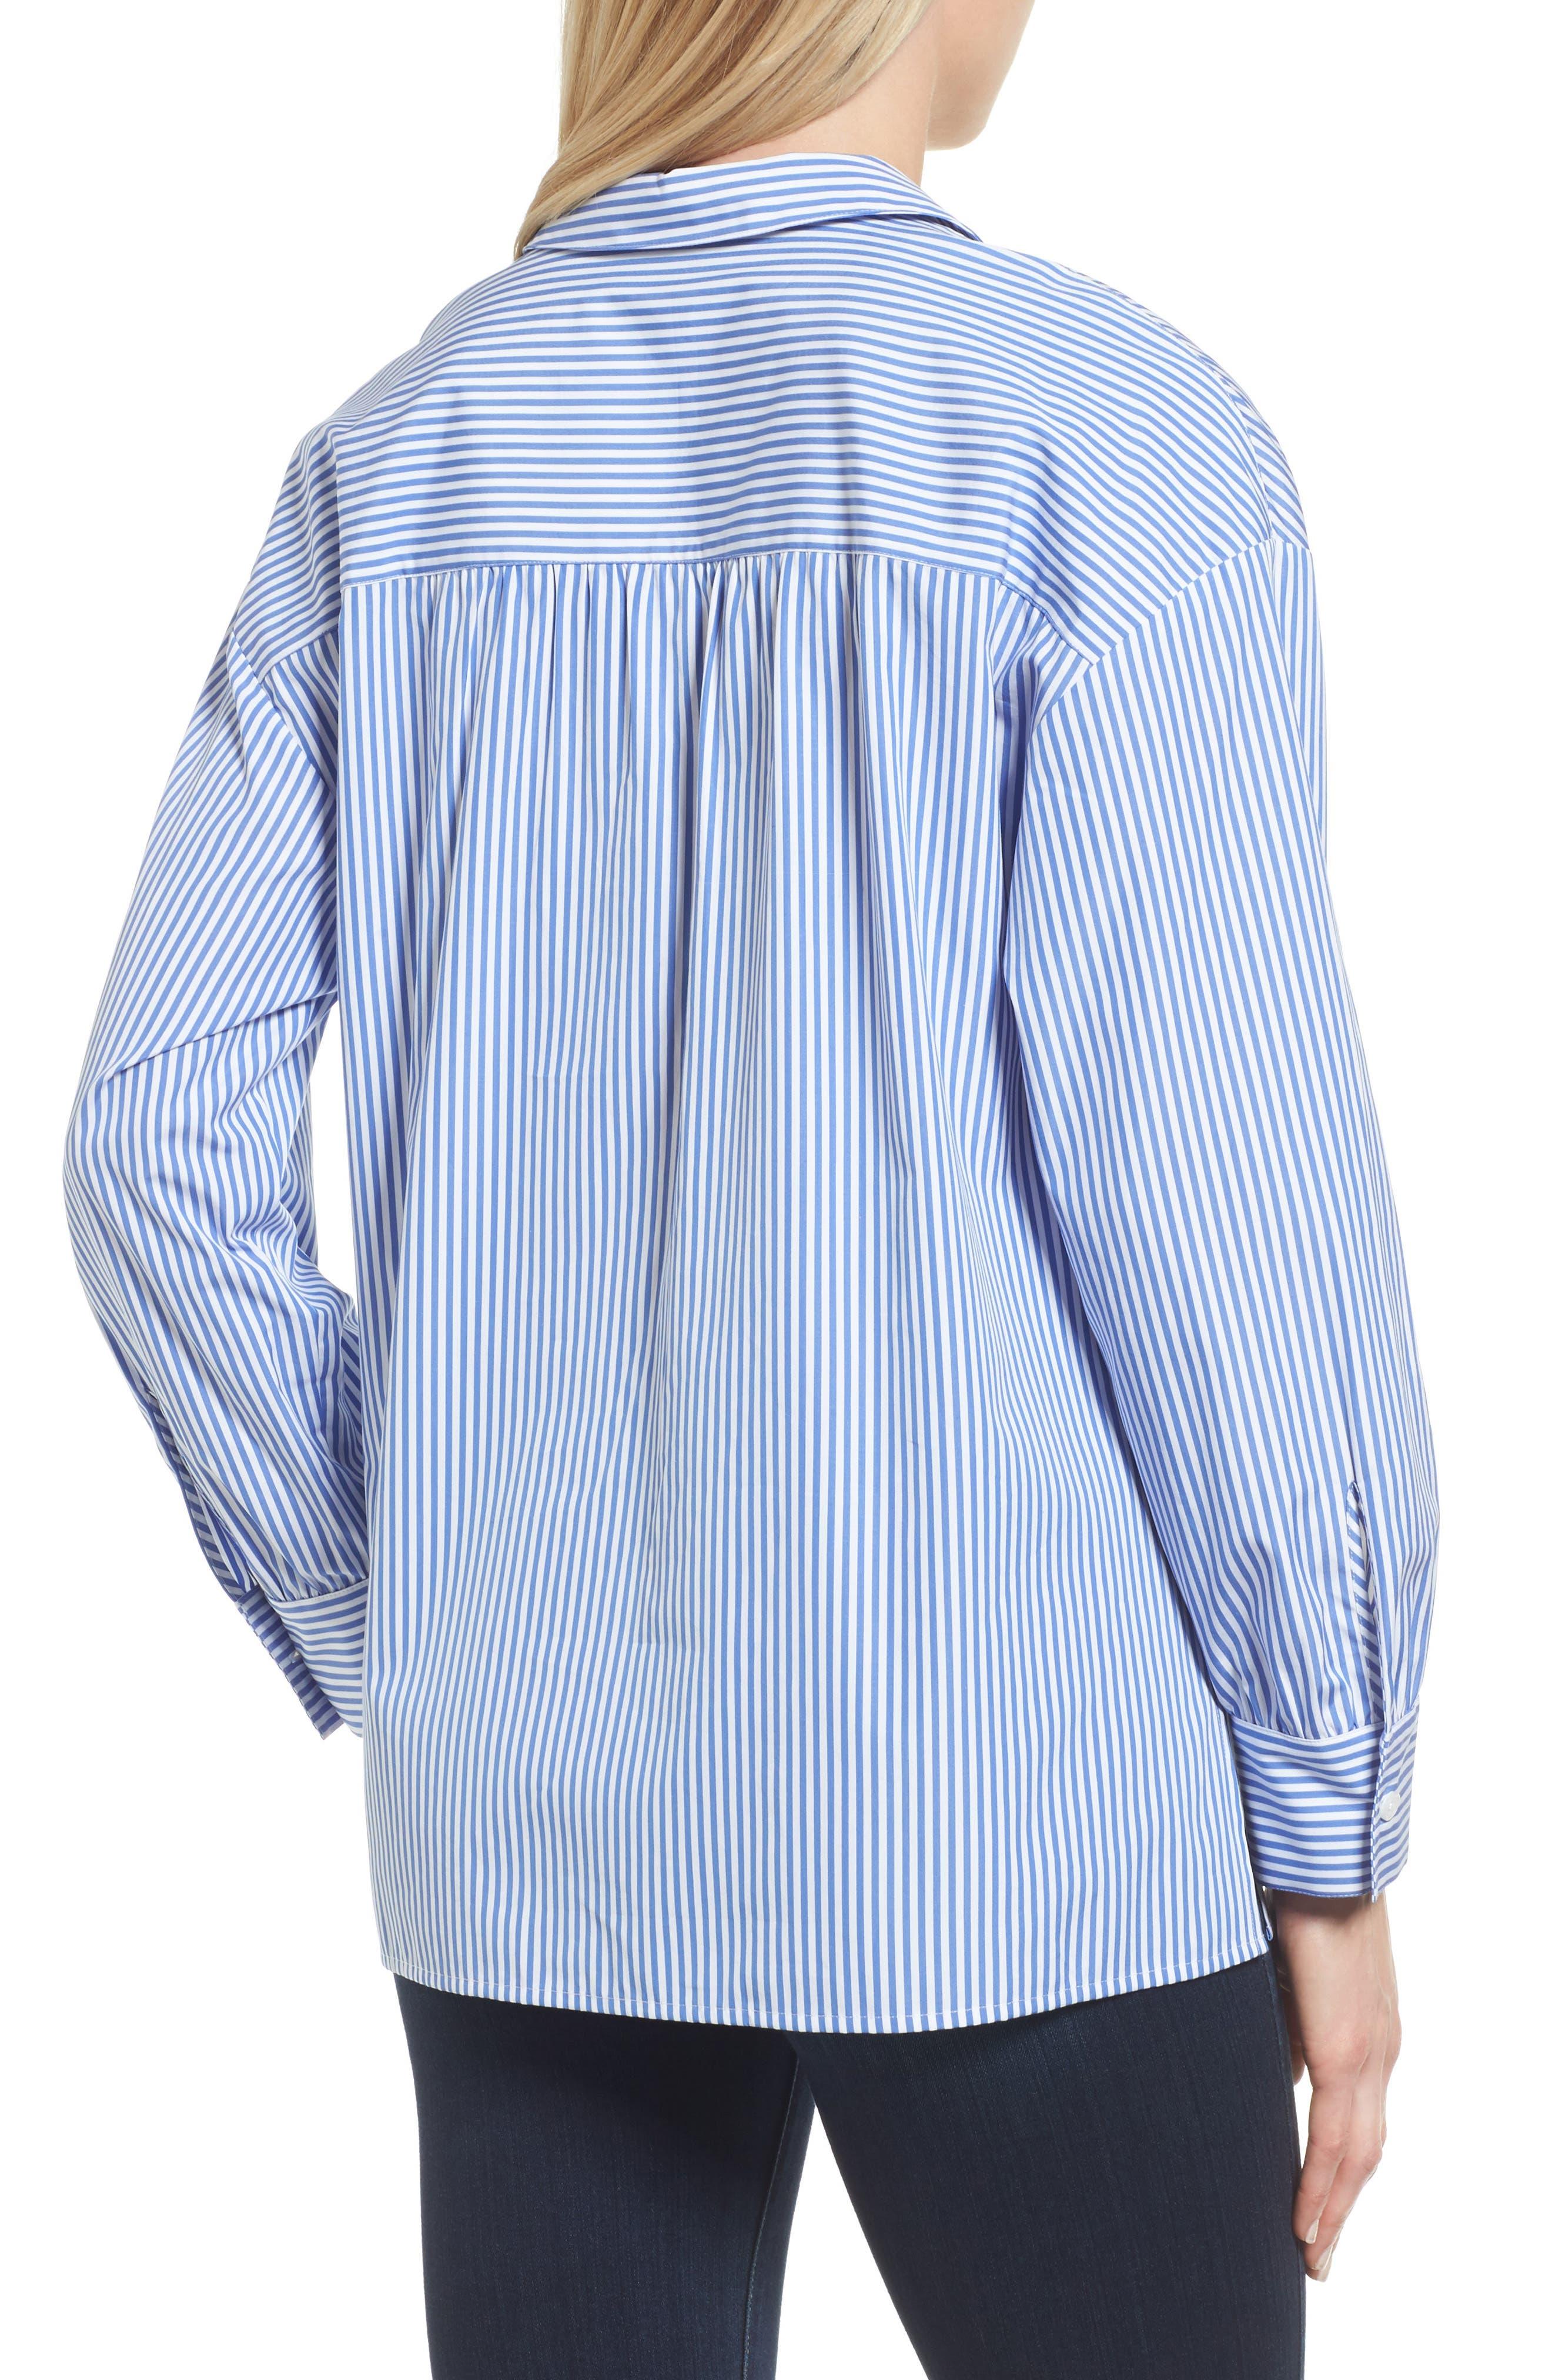 Lace-Up Stripe Shirt,                             Alternate thumbnail 2, color,                             420